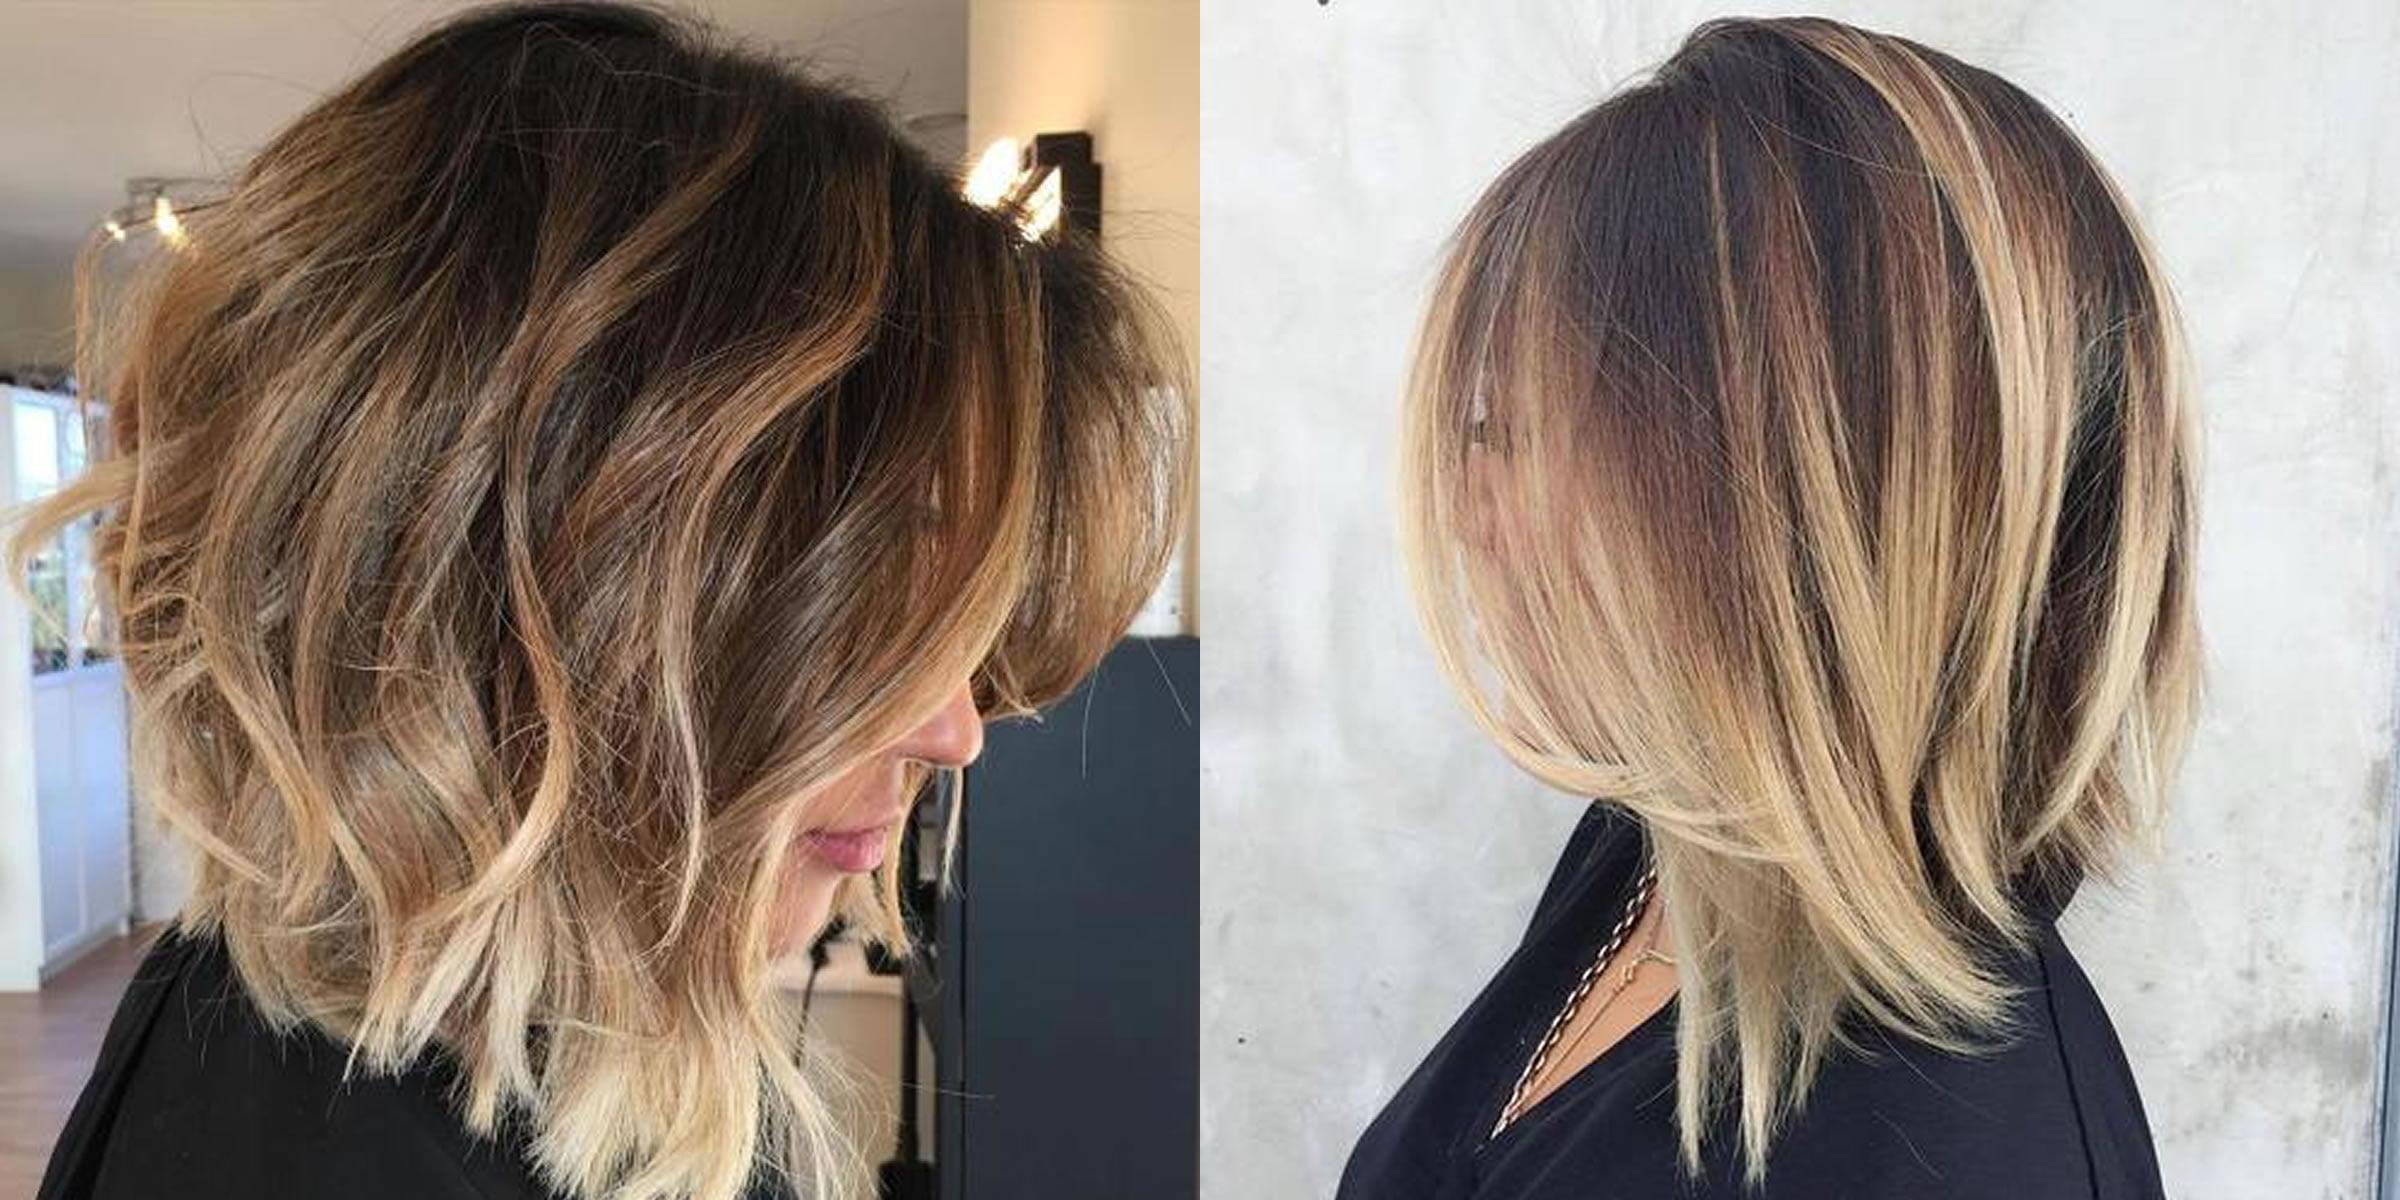 Long bob hairstyles and hair colors